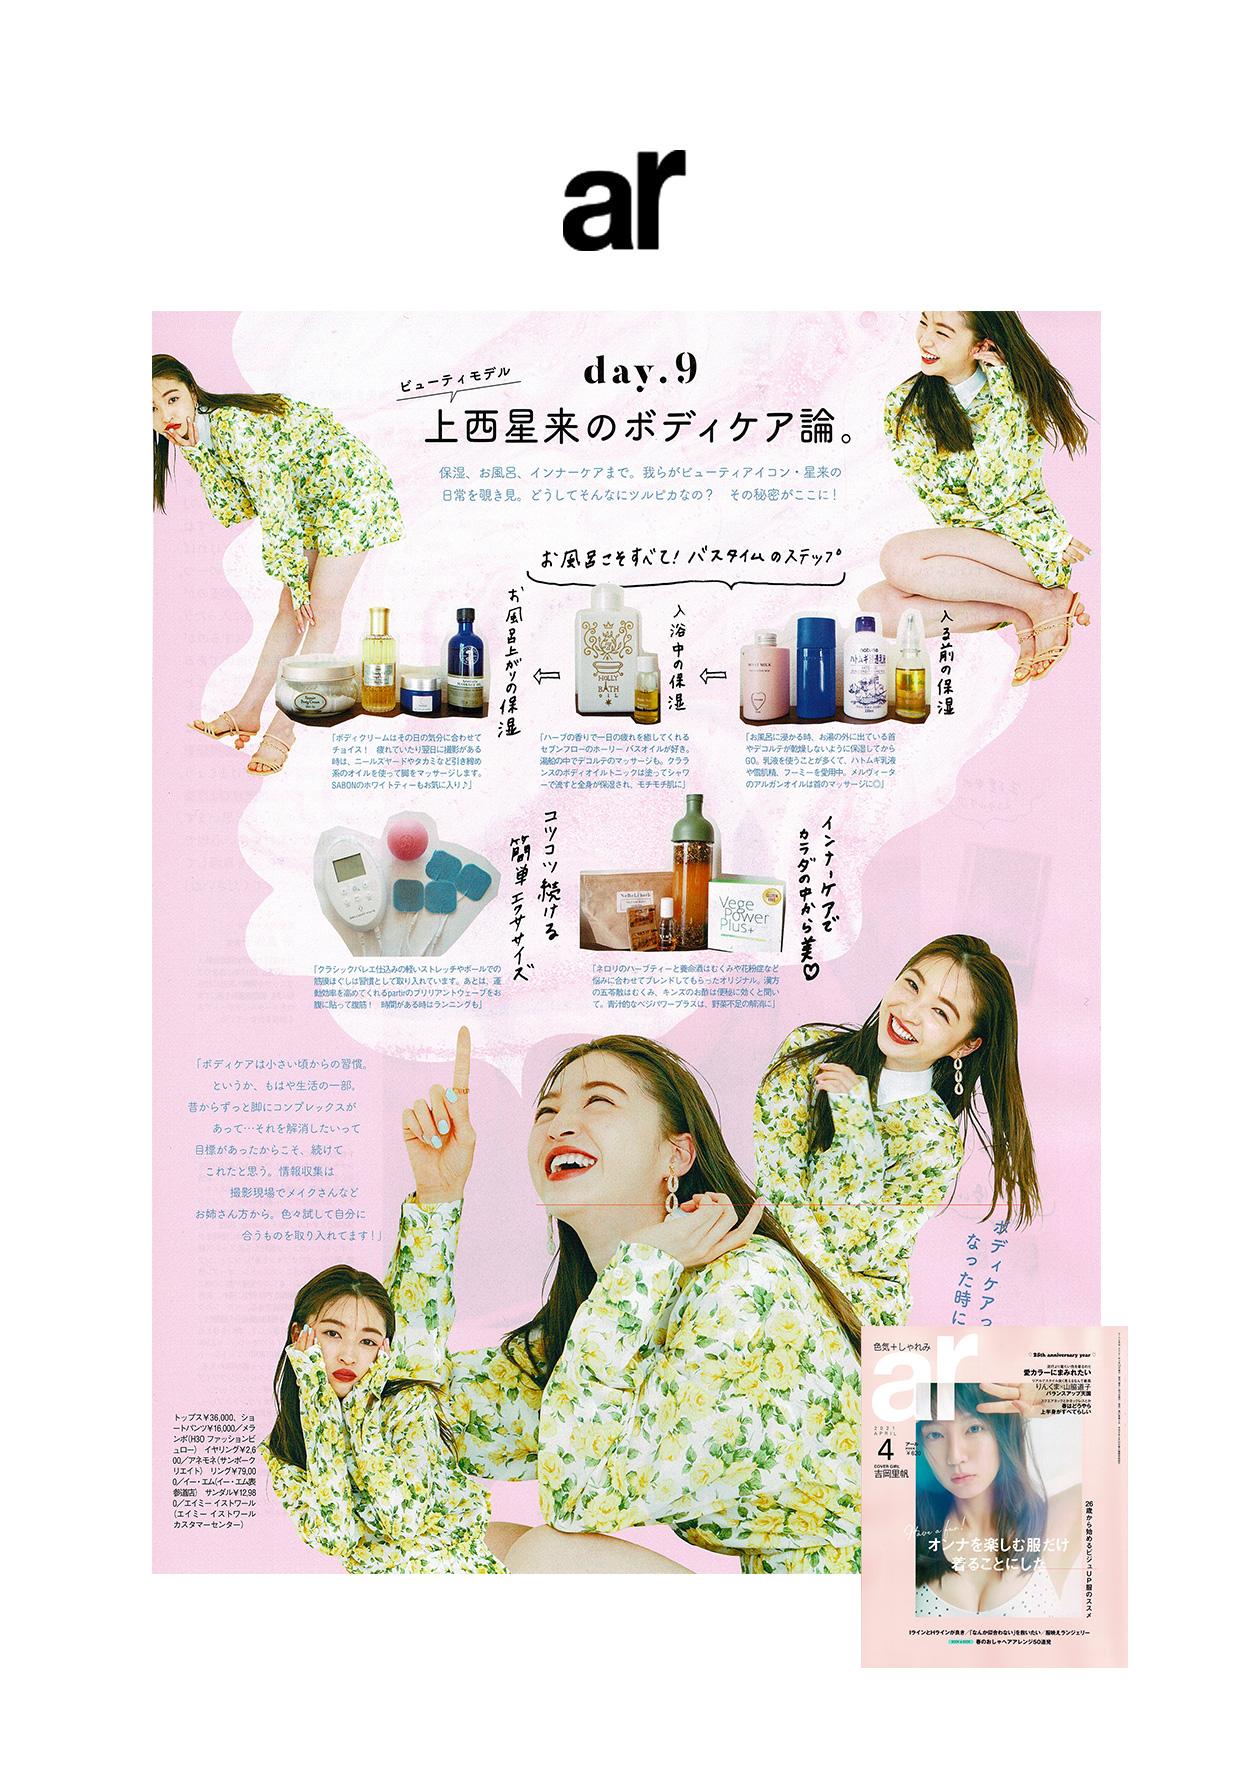 melampo press on sweet magazine 4